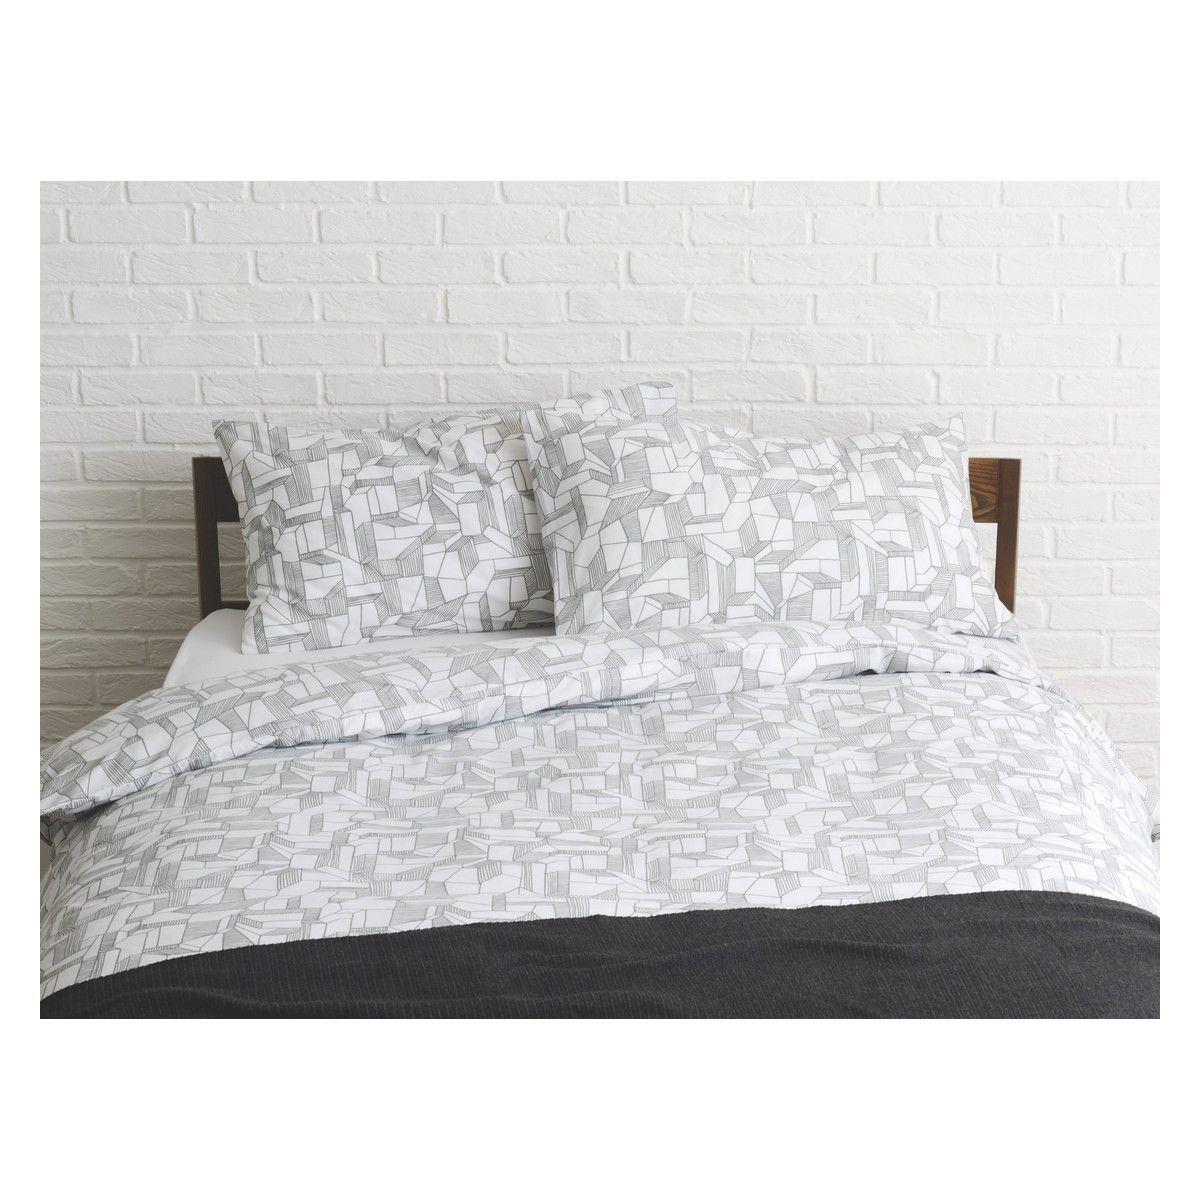 mineral grey patterned double duvet cover set buy now at habitat uk